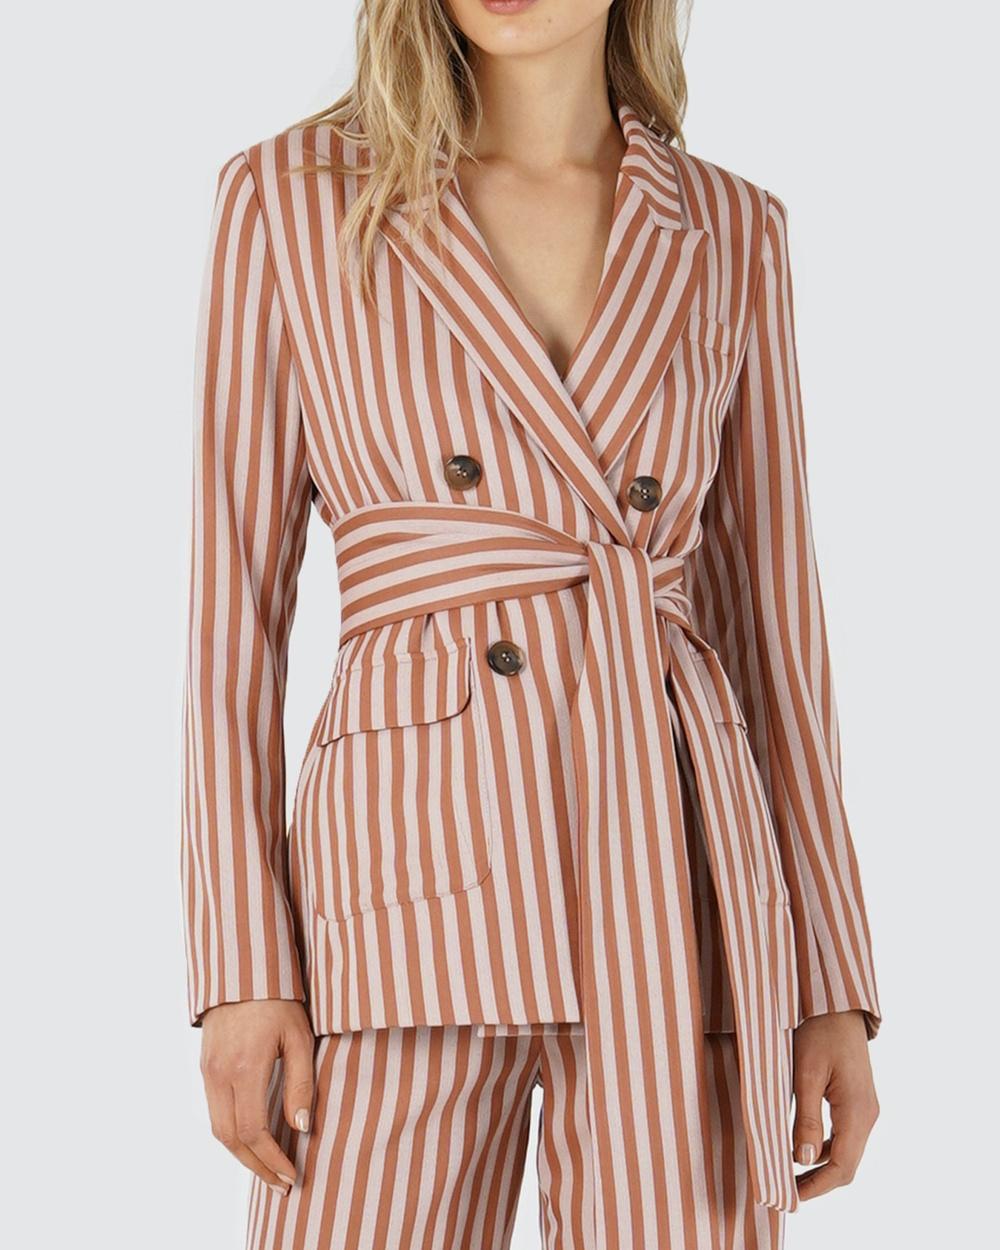 Amelius Cardinal Jacket Suits & Blazers Pink